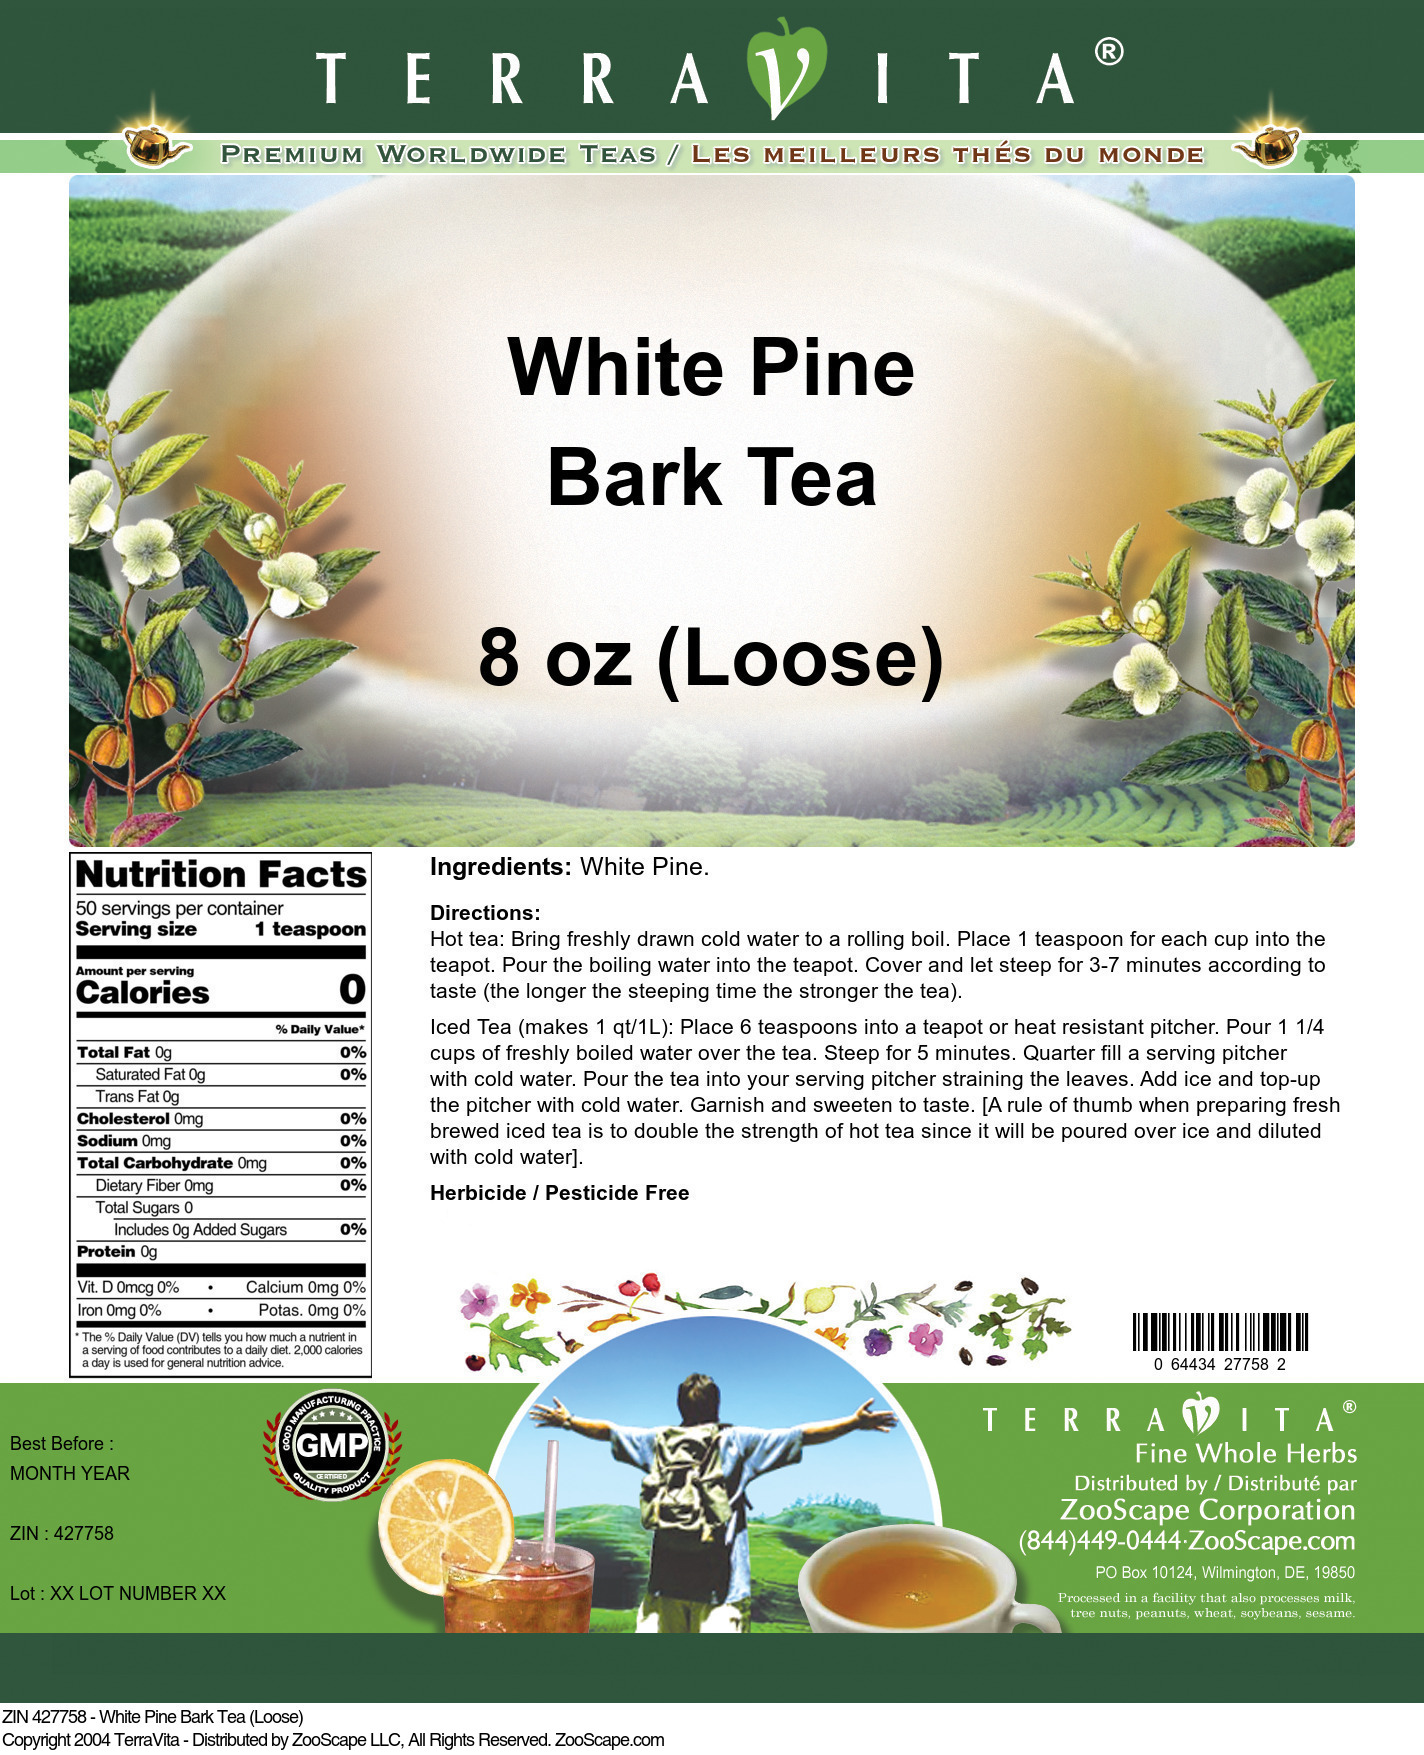 White Pine Bark Tea (Loose) - Label